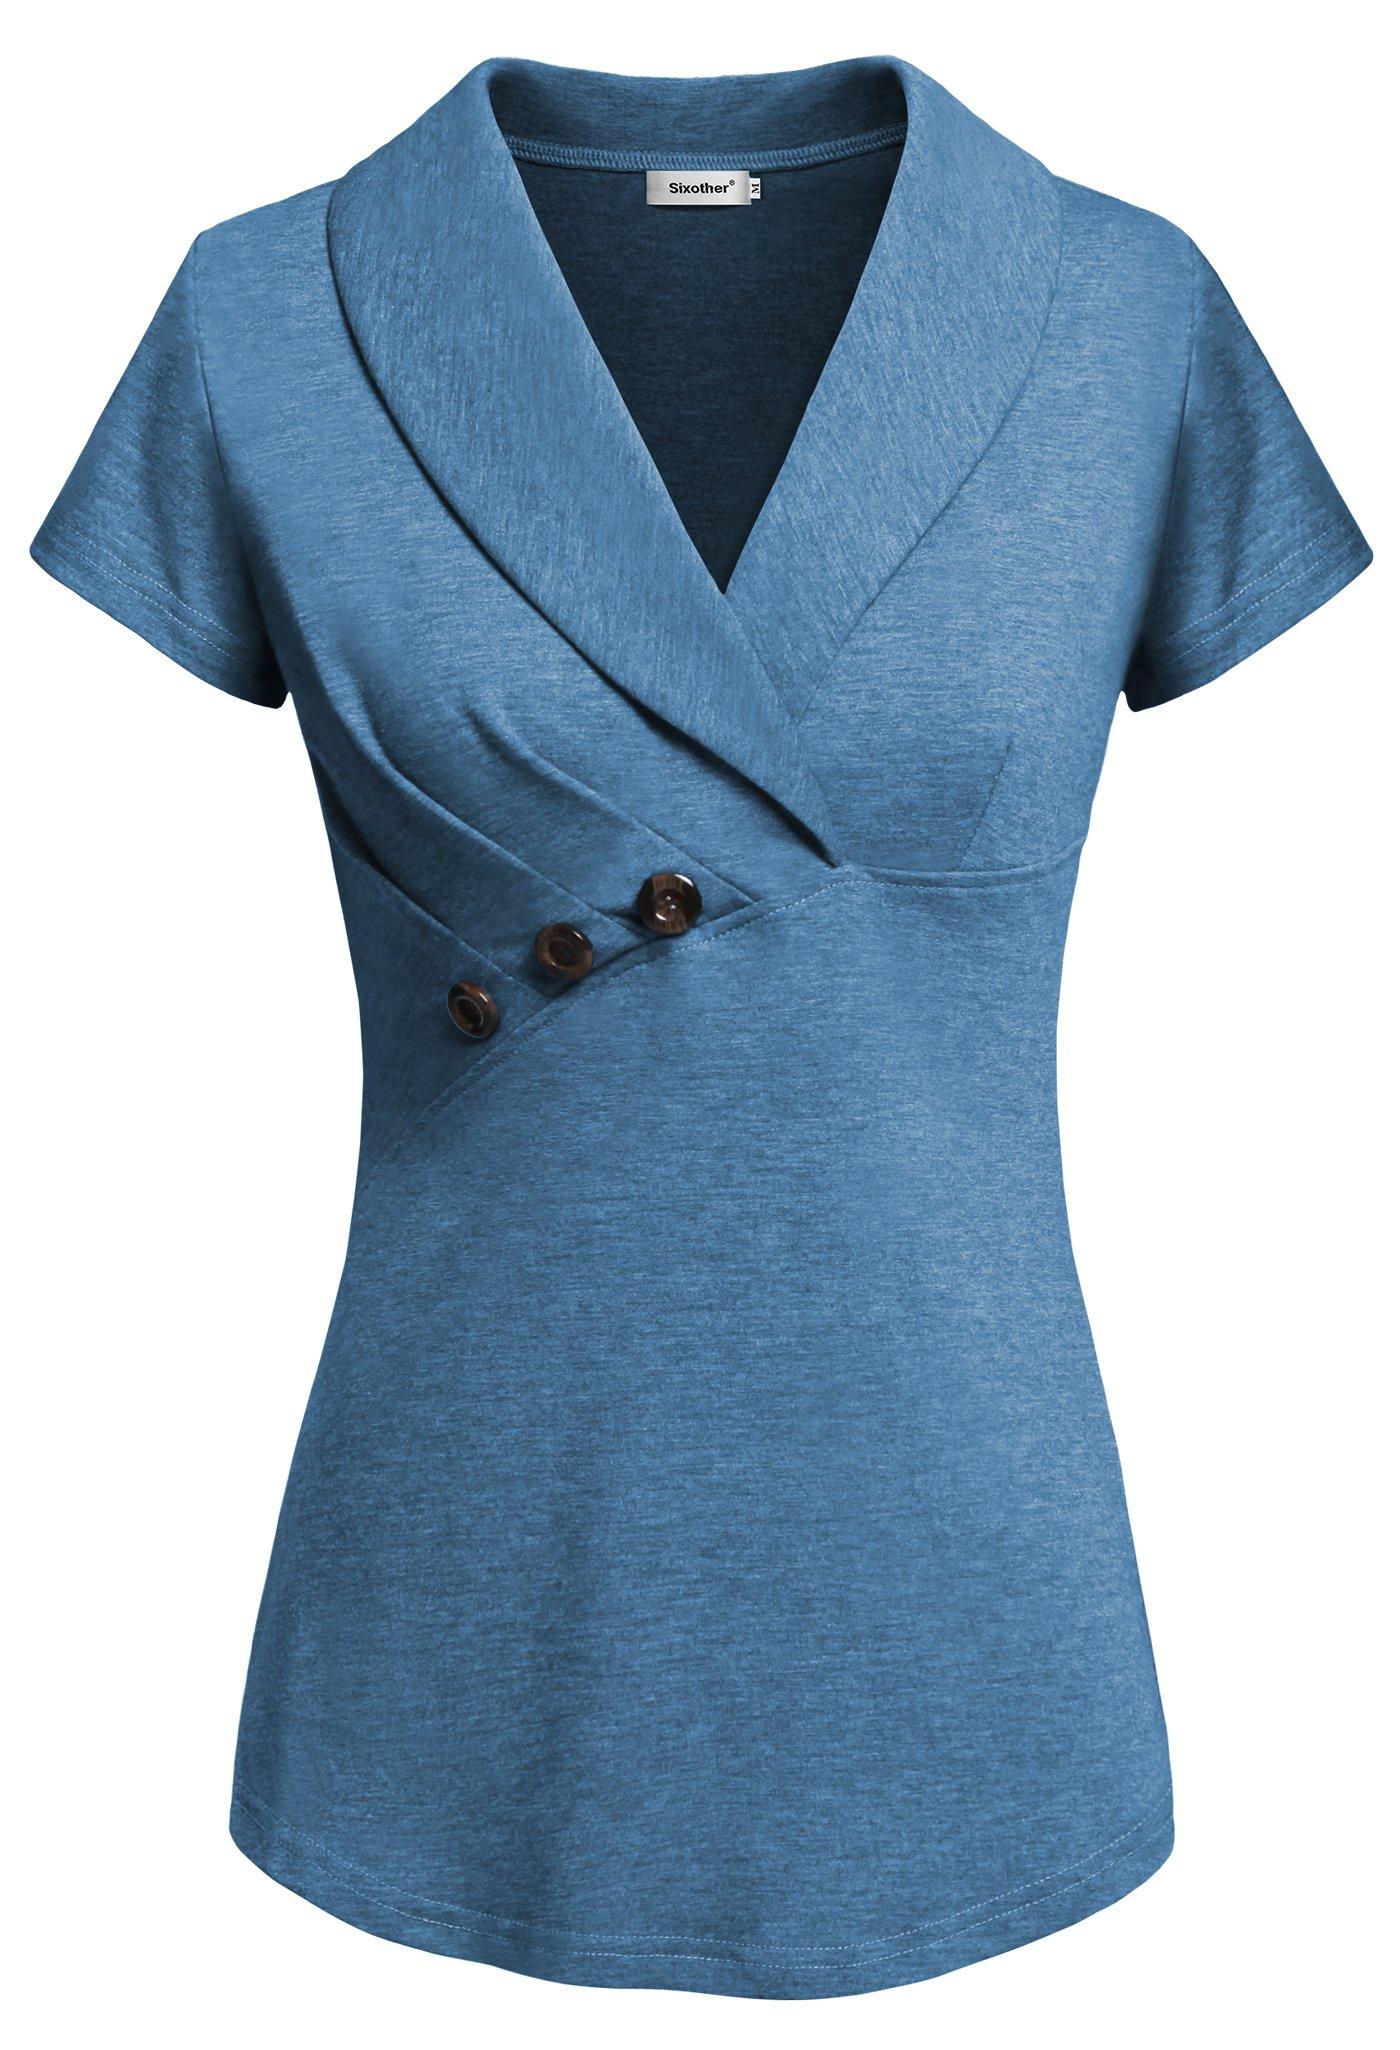 Sixother Woman's Shirt for Summer, Casual Summer Tops for Women Short Sleeve Blouse Business Shirt Soild Color Stylish Botton Blouse Shirt Ladies Blue XL